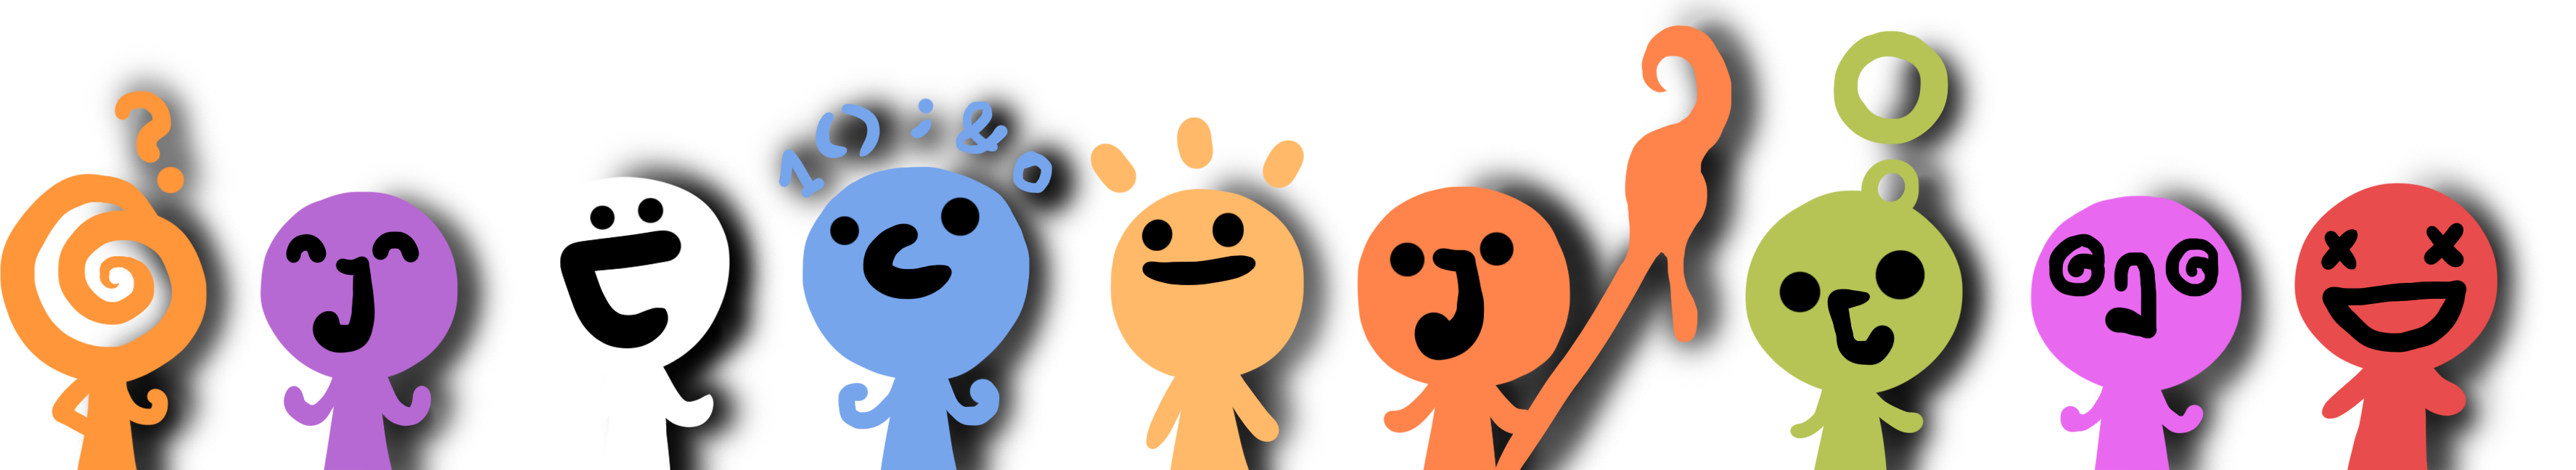 Blackthornprod's mascots